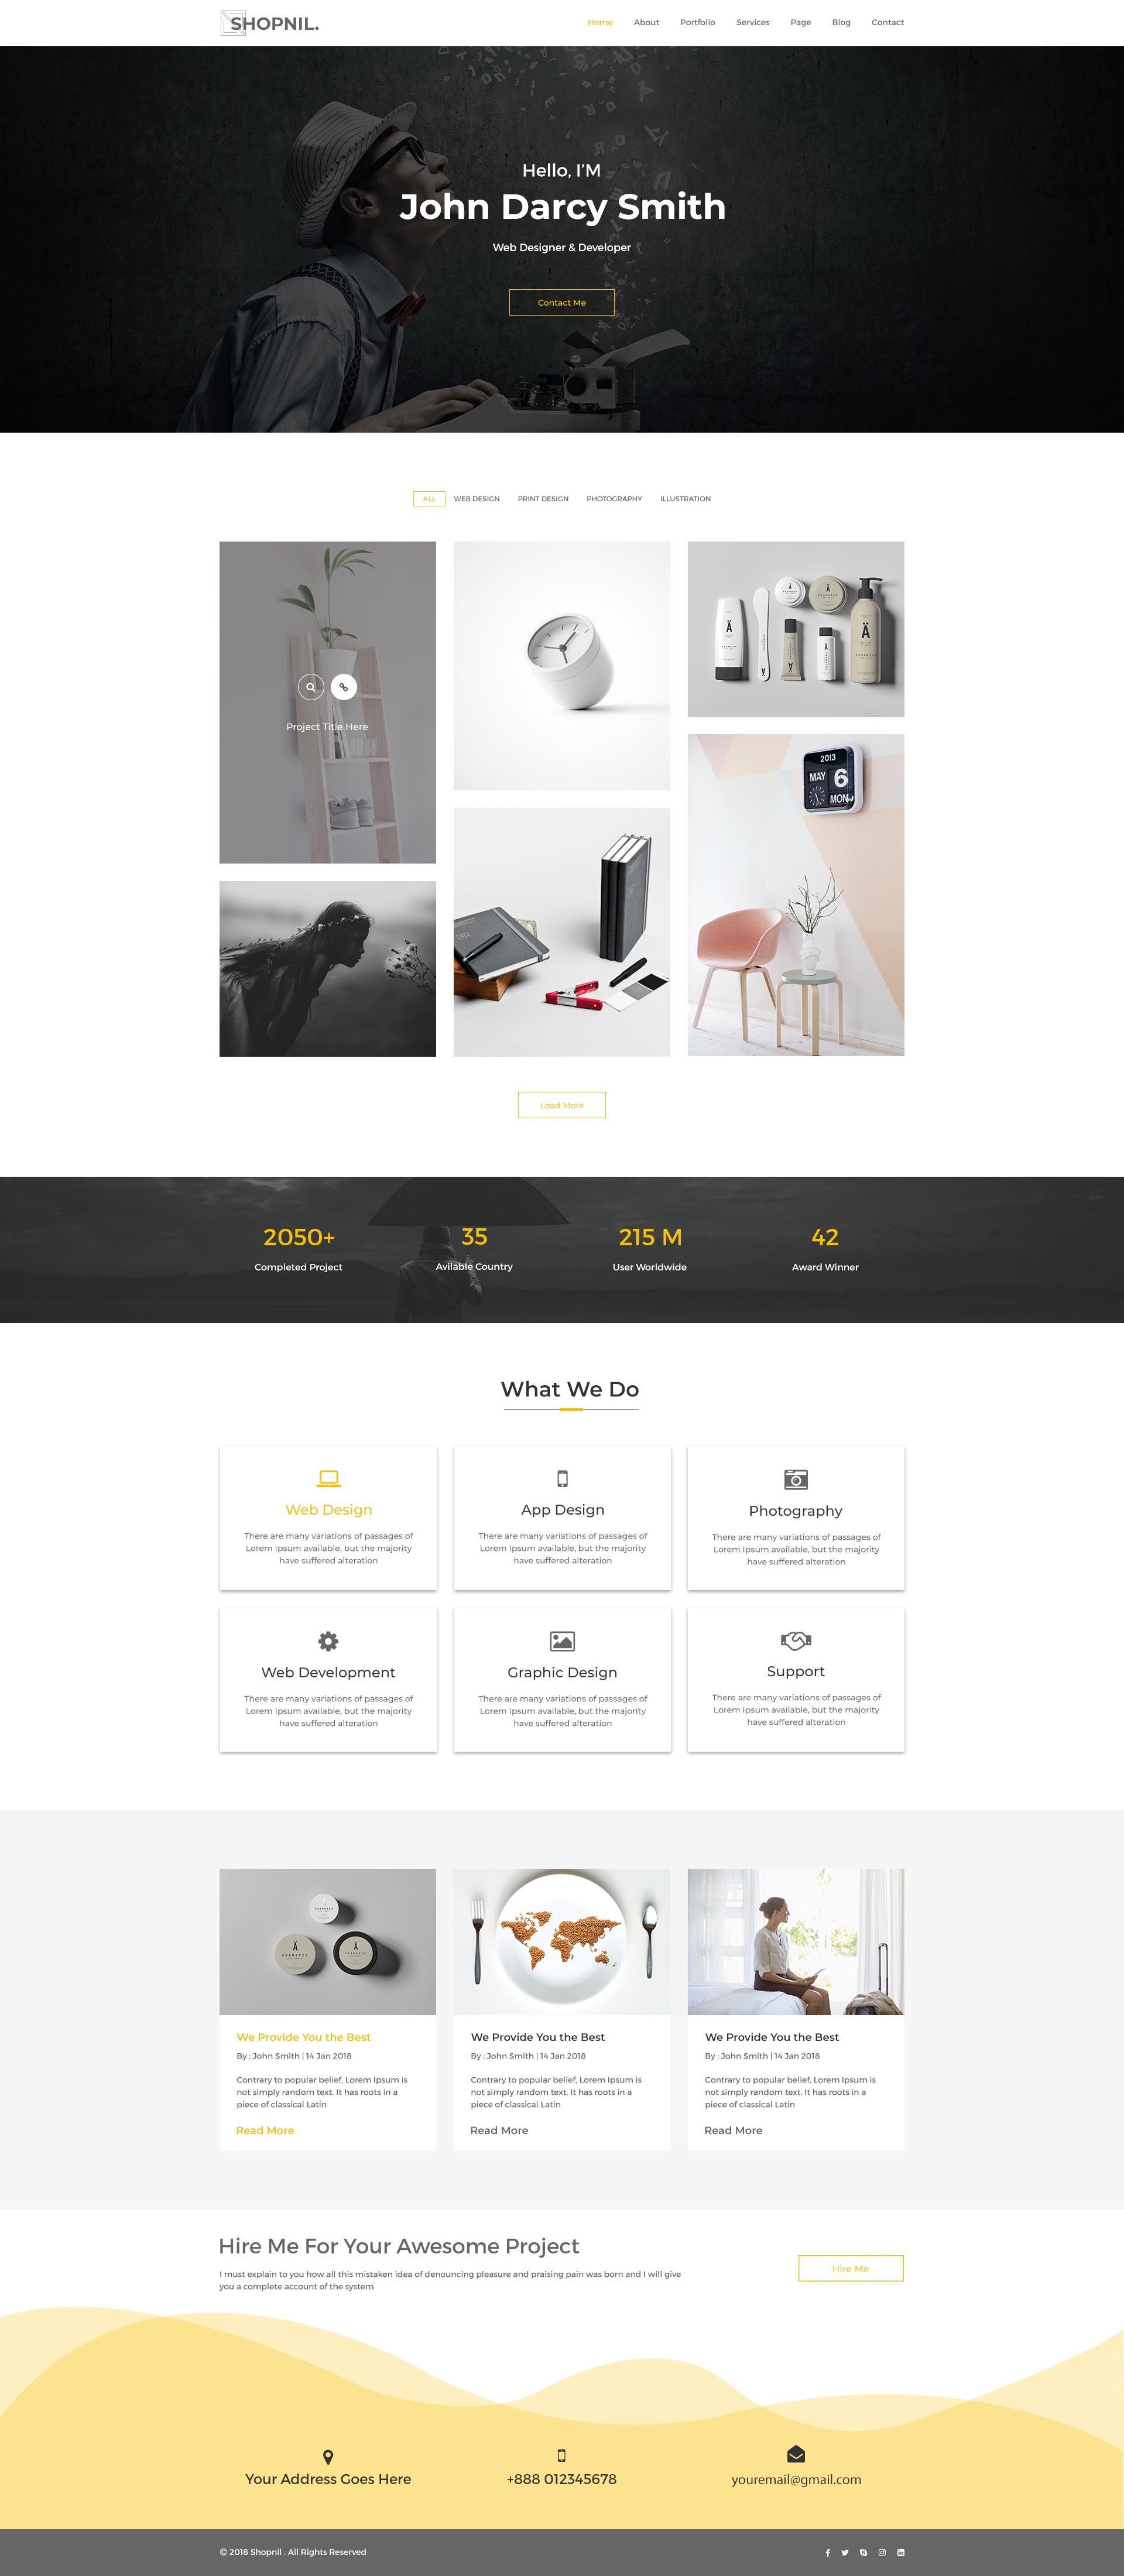 Shopnil - Portfolio PSD Template | Pinterest | Psd templates ...